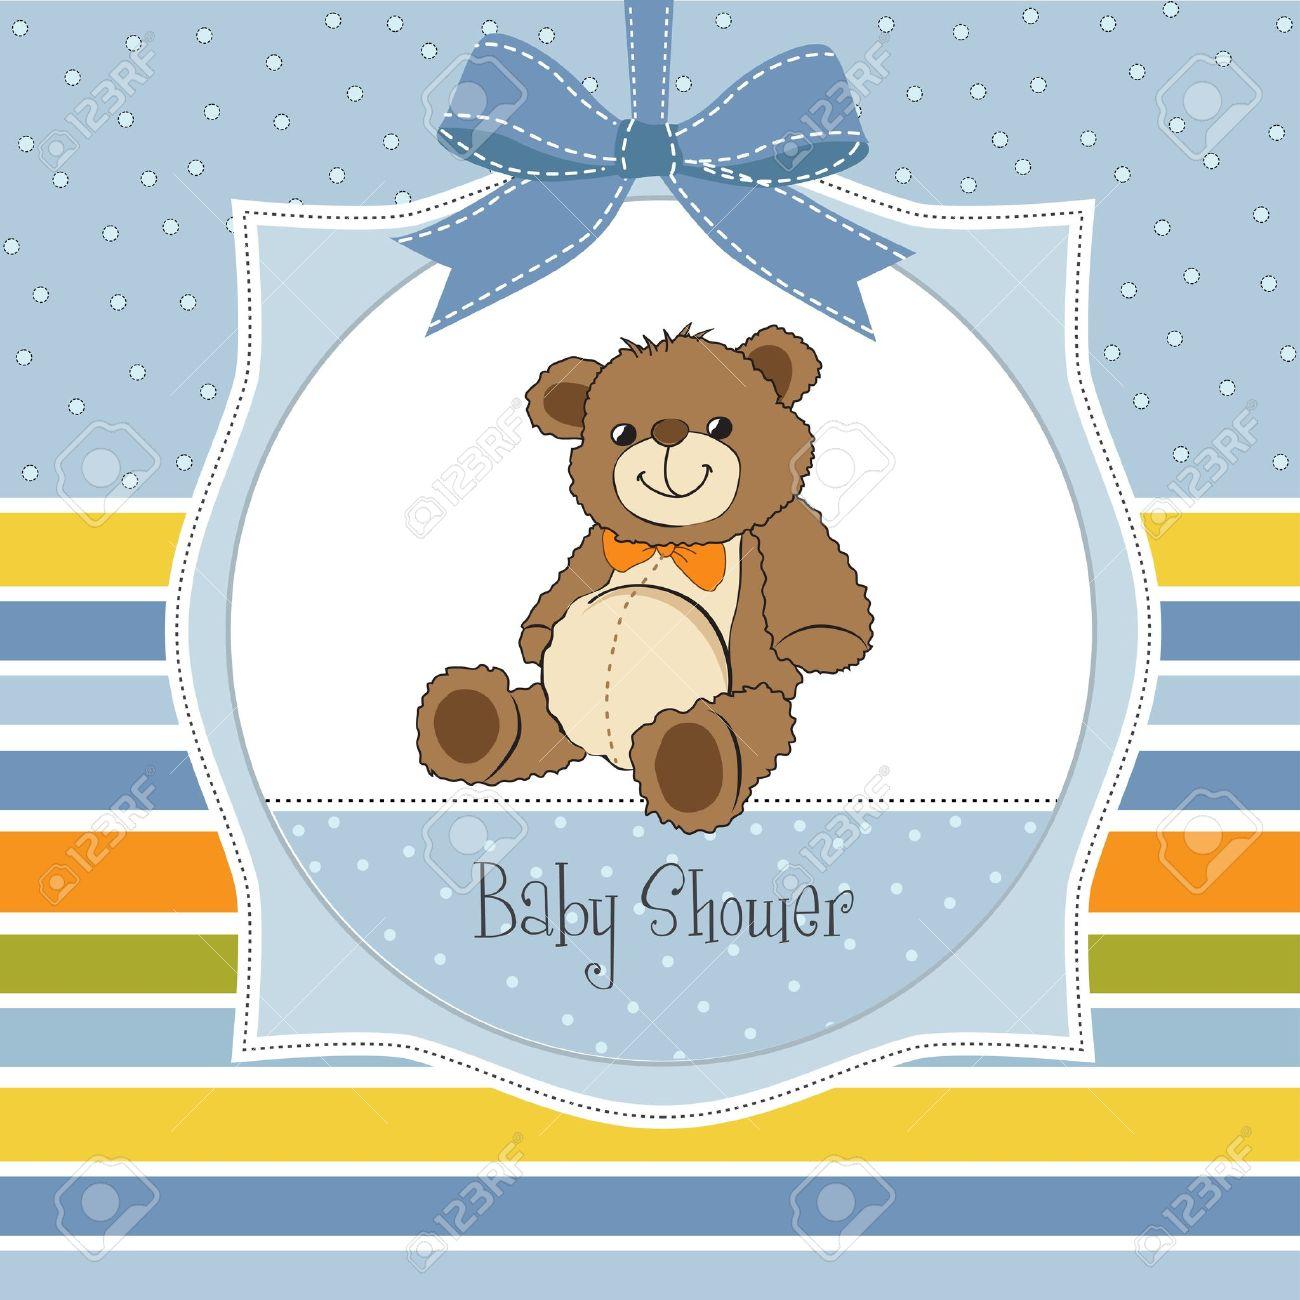 baby shower card with cute teddy bear toy Stock Vector - 14662014